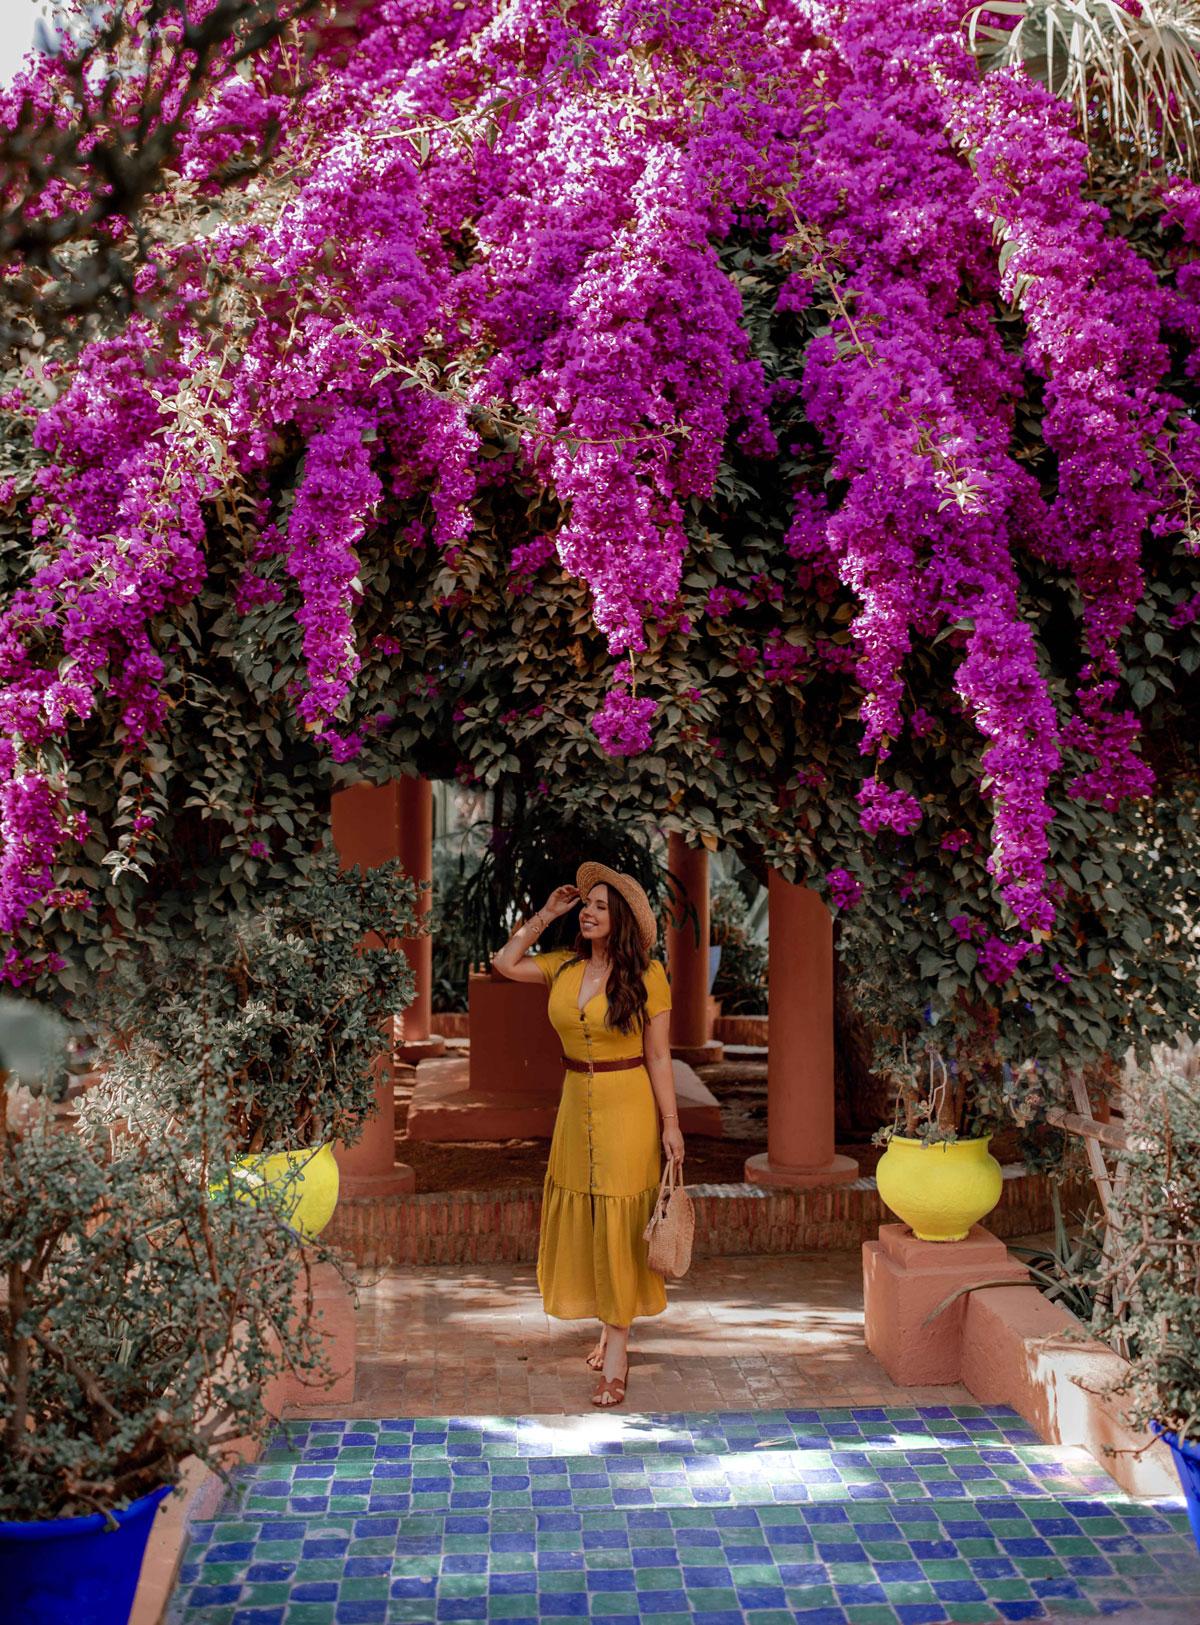 Top-things-to-do-in-marrakech-Bucket-list-kelseyinlondon-Kelsey-Heinrichs--What-to-do-in-marrakech--Where-to-go-in-marrakech-top-places-in-marrakech-le-jardin-majorelle